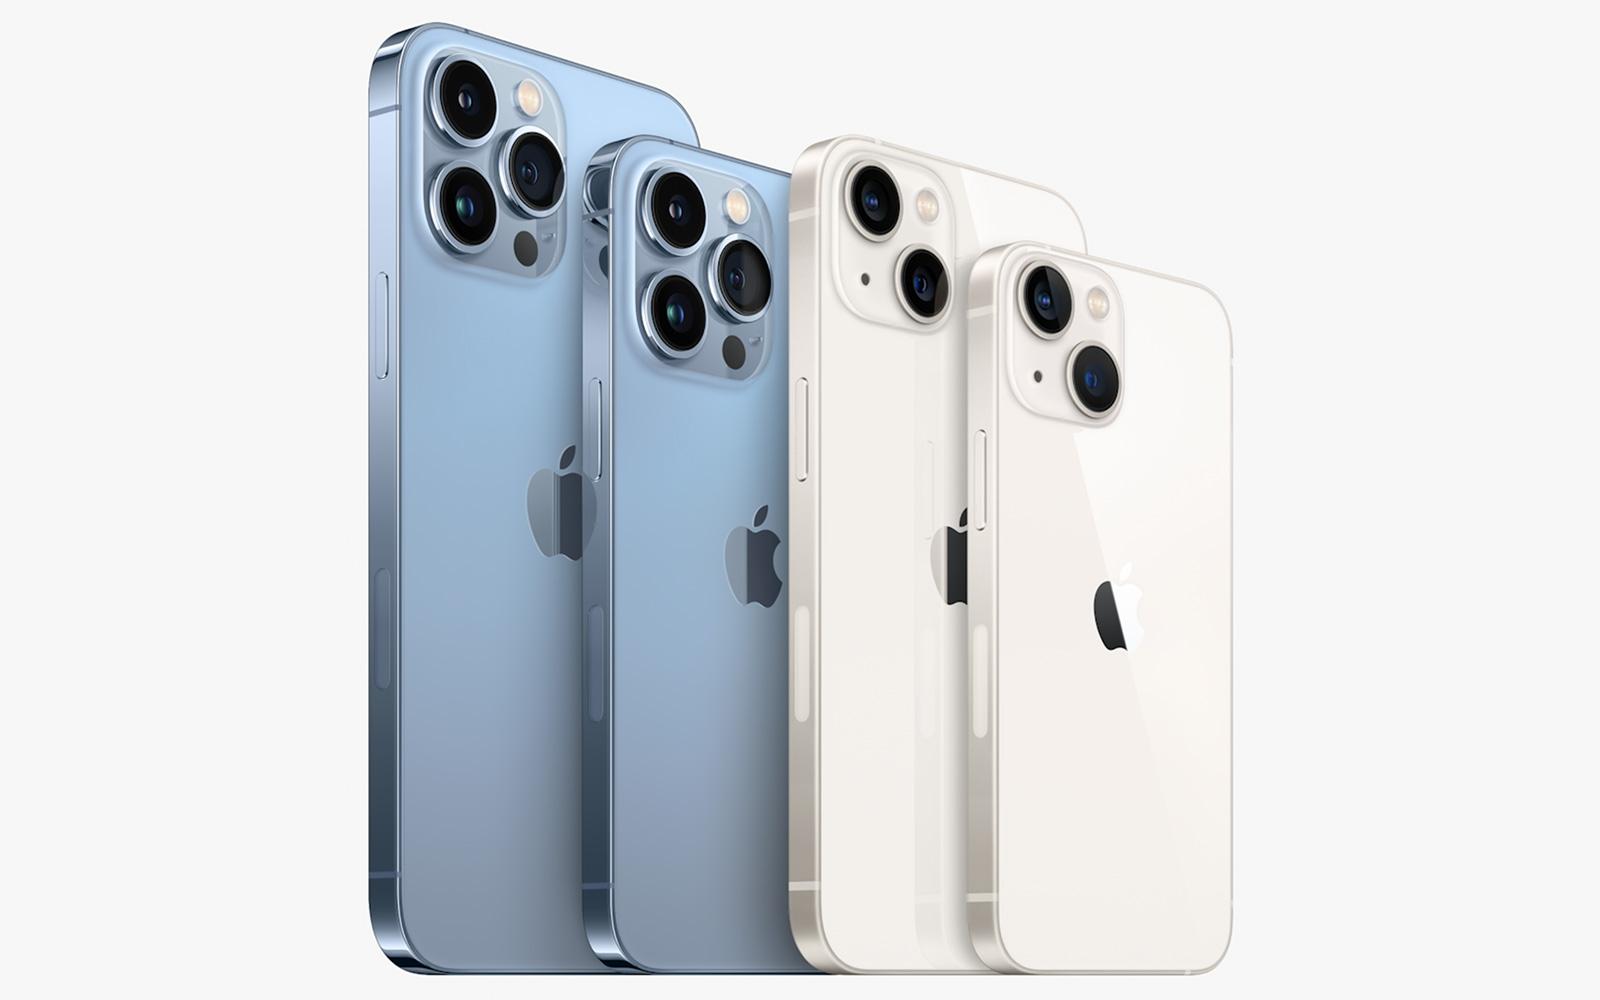 Apple iPhone 13 Pro iPhone 13 Pro Max